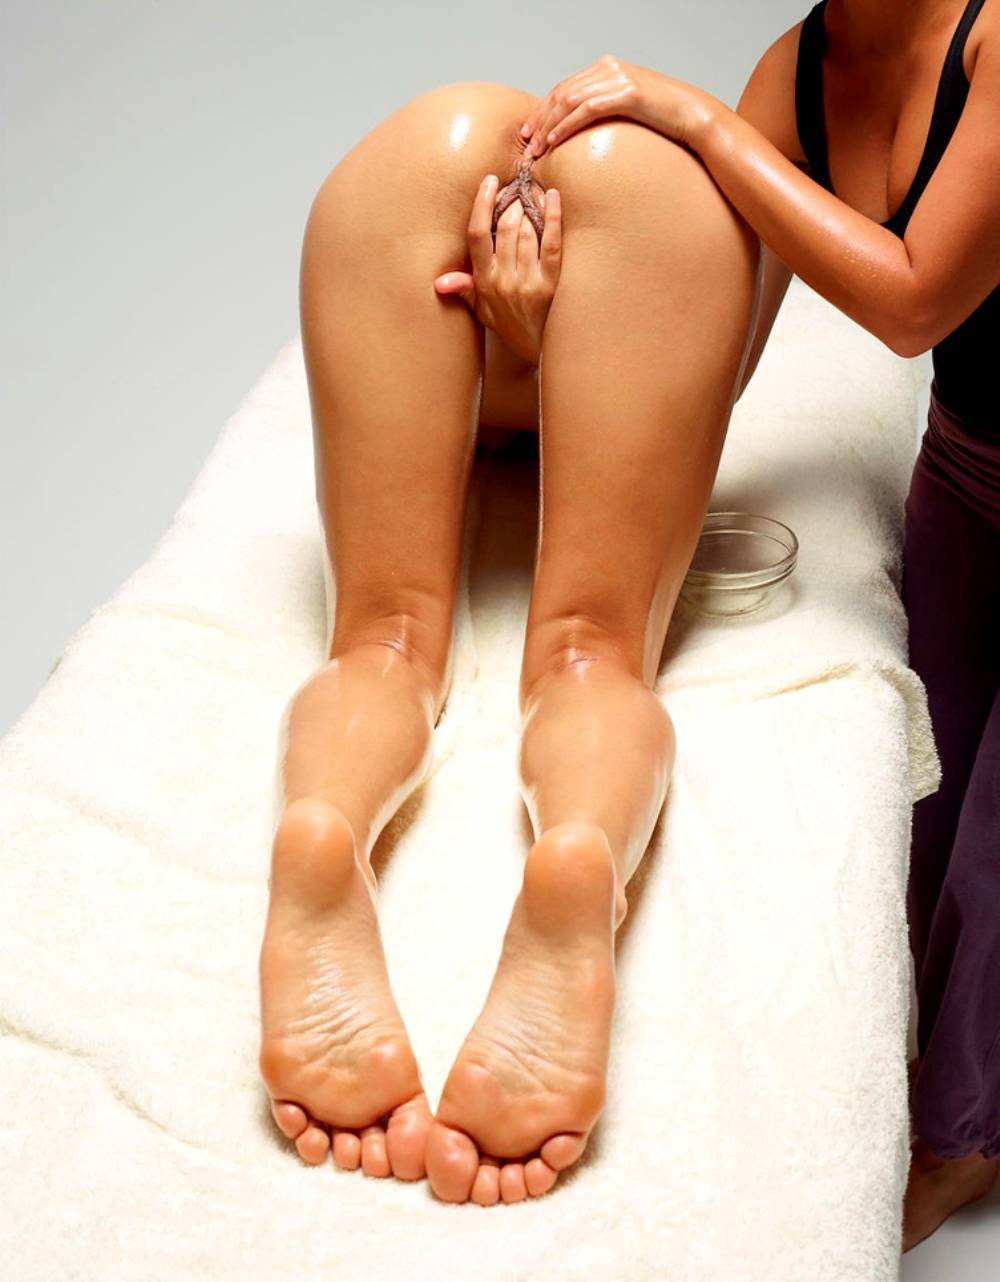 Эро массаж киски 8 фотография